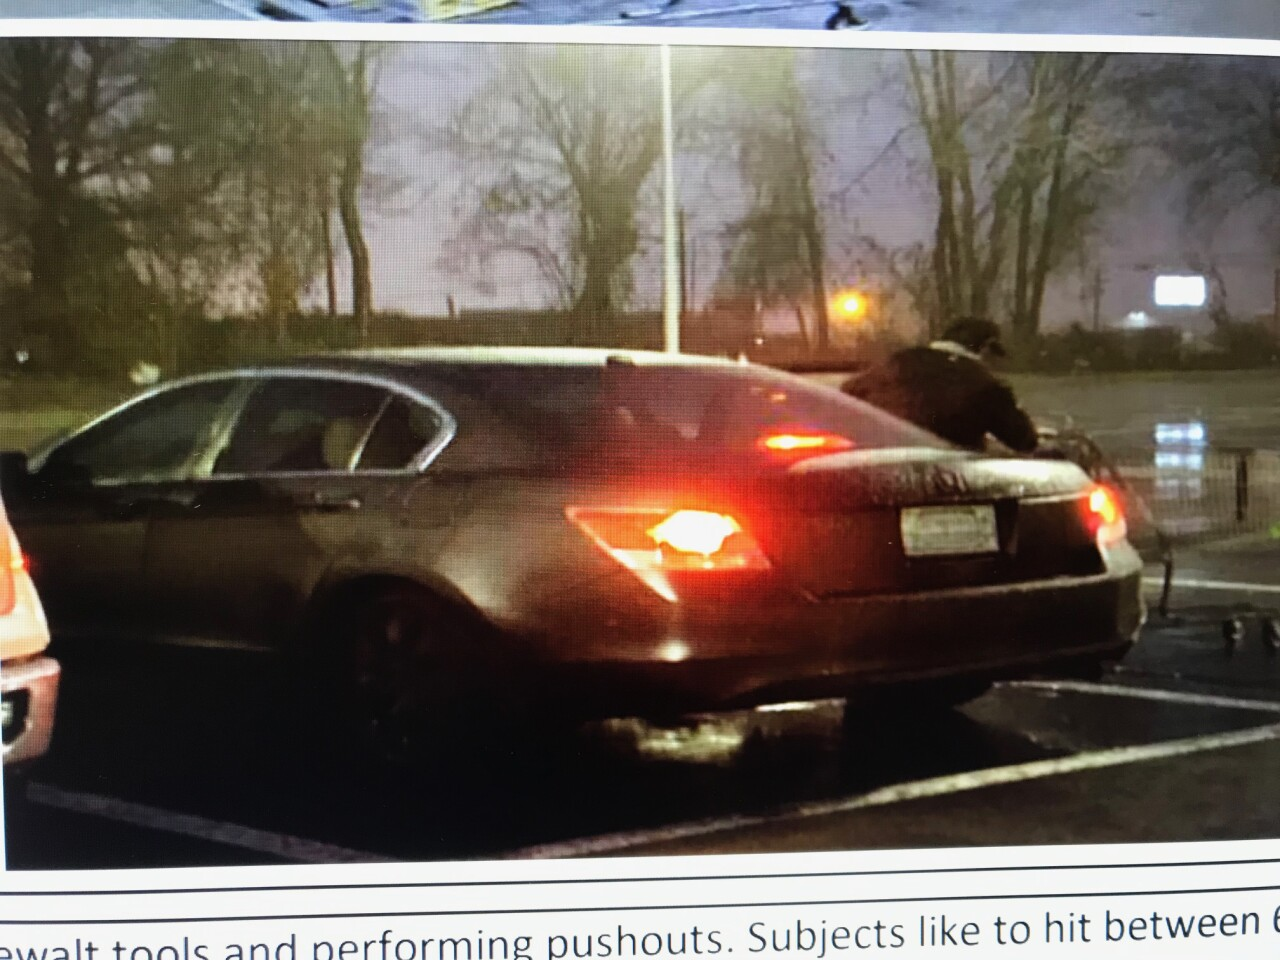 Clarksville Robbery Suspect 2 - 32420